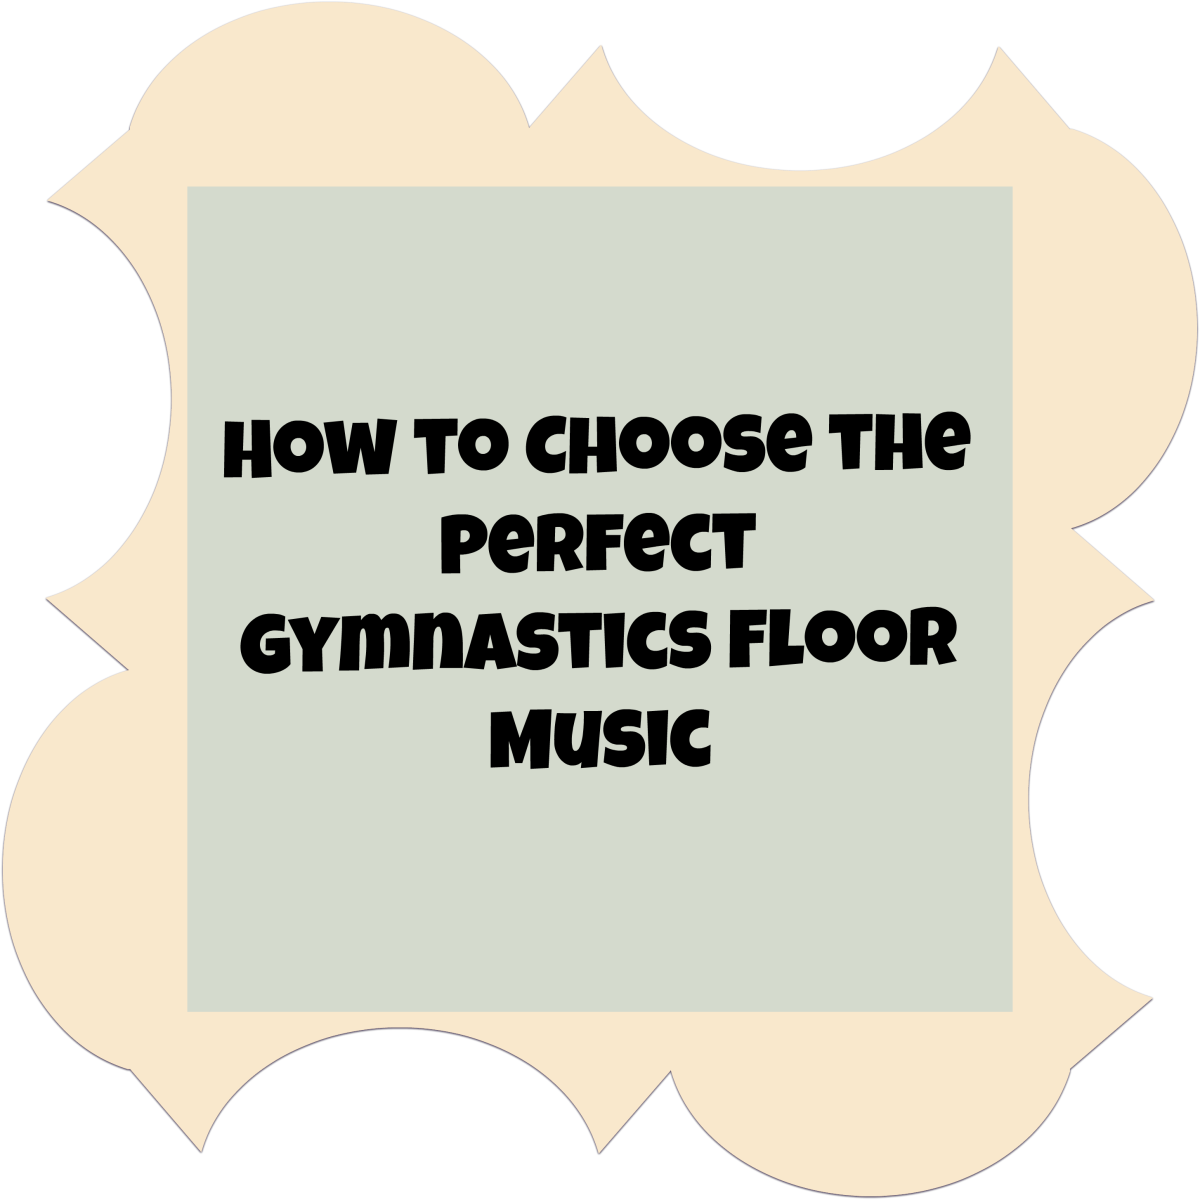 how-to-choose-the-best-gymnastics-floor-music